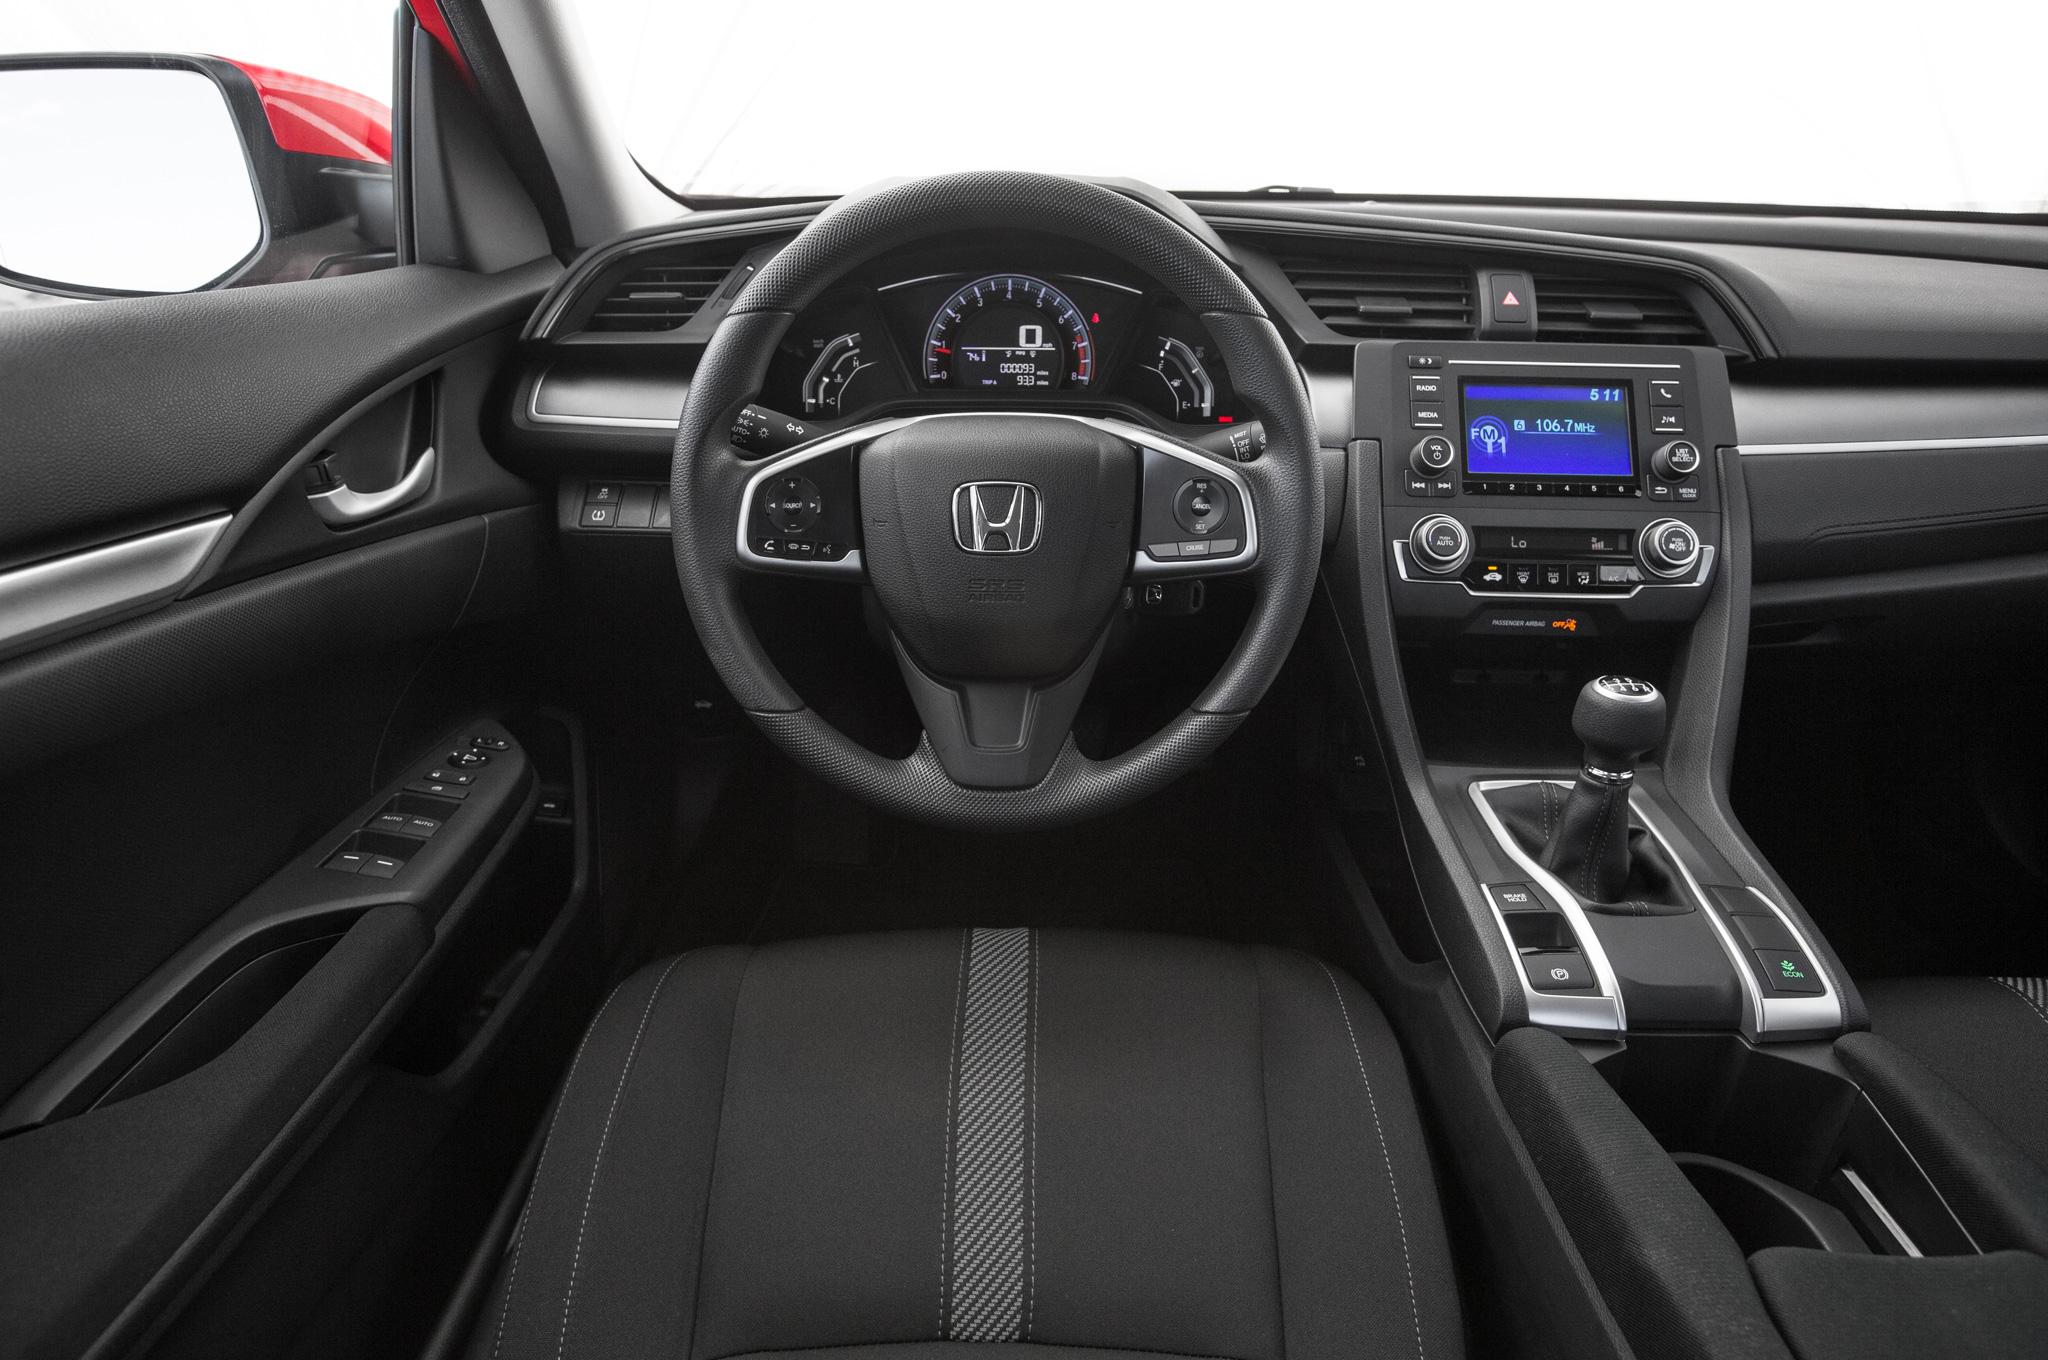 Honda Civic 2016 Interior